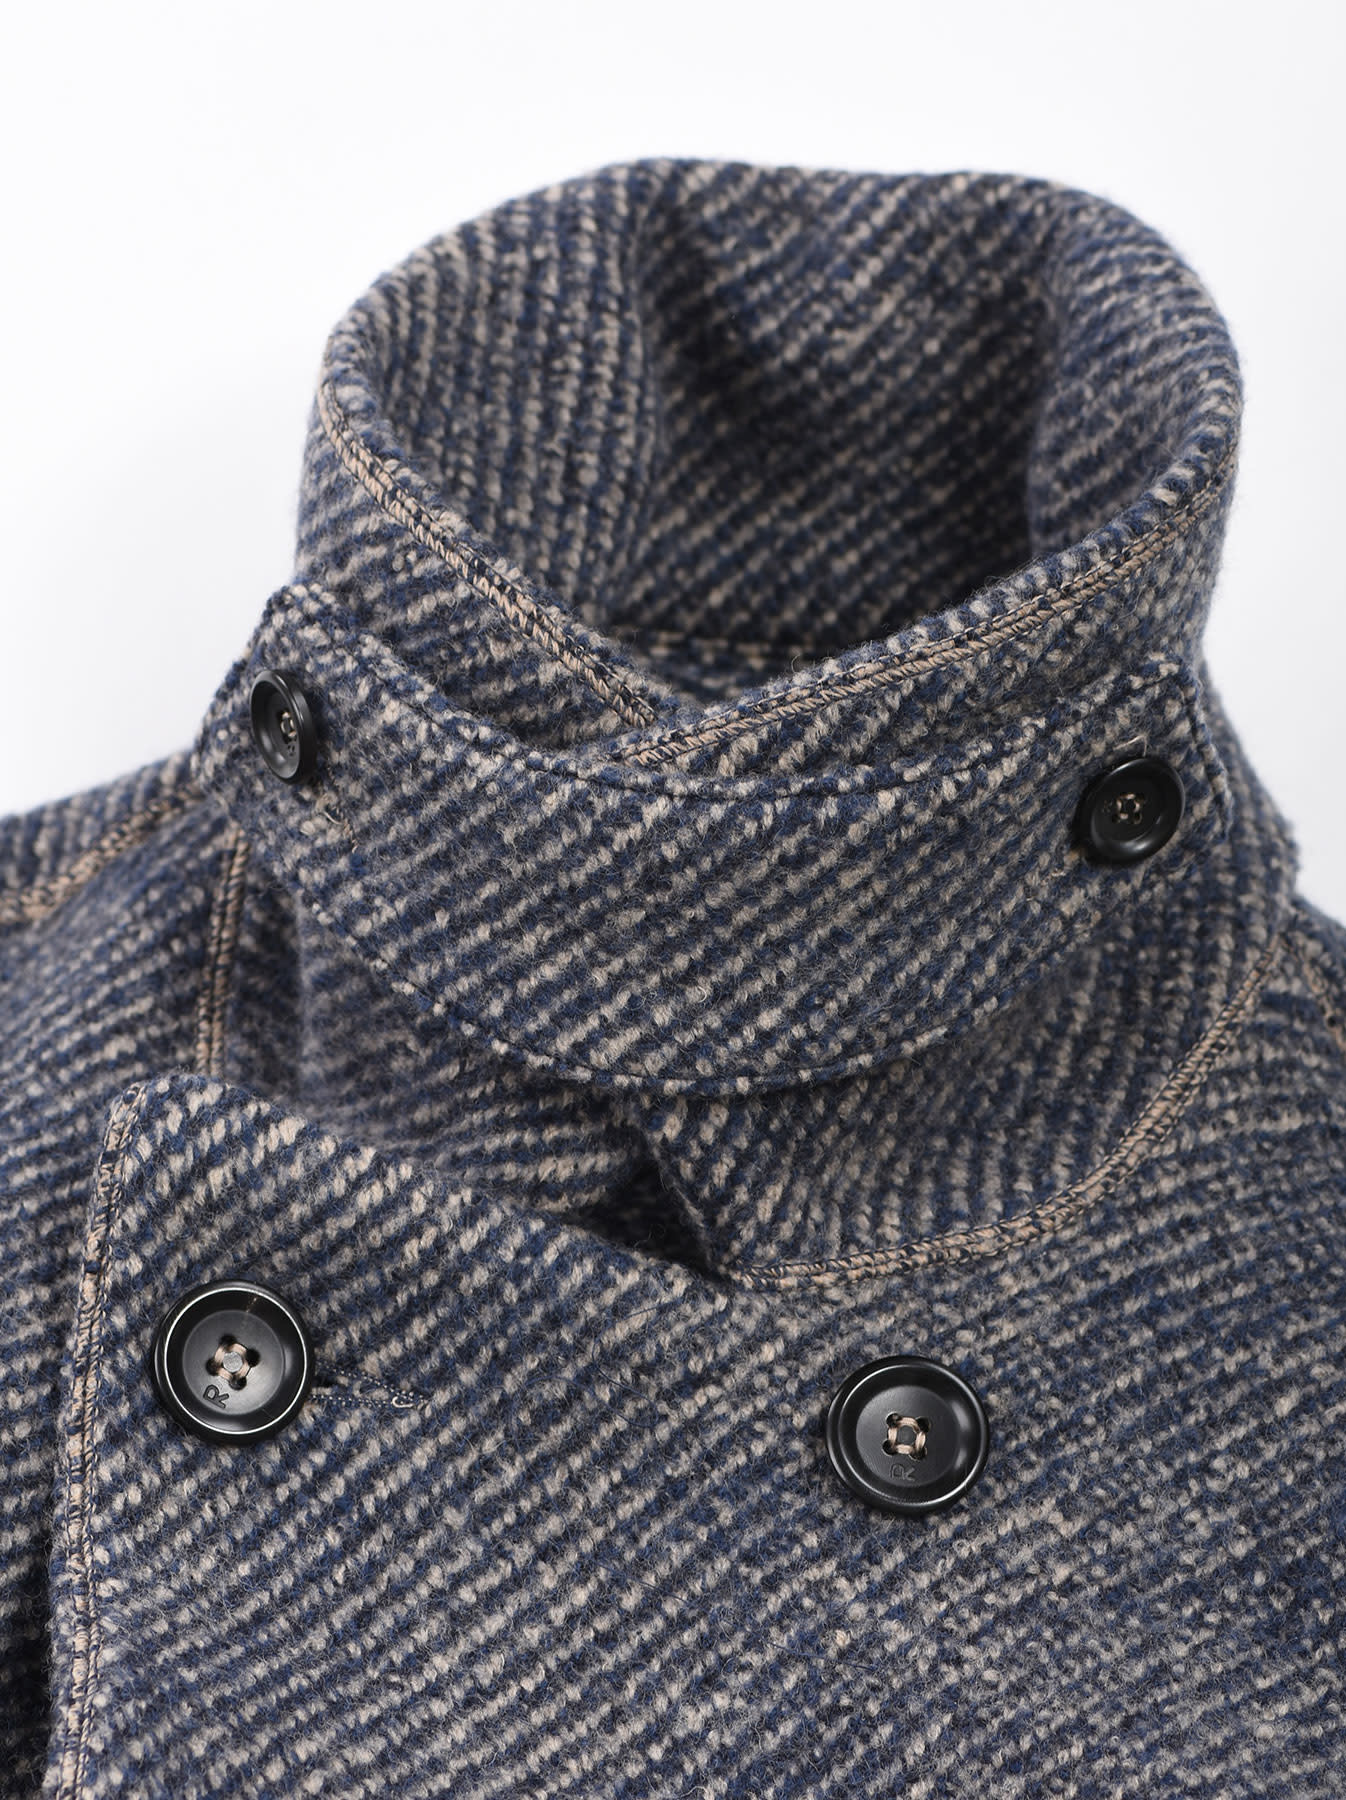 Denim Tweed Knit Coat-7